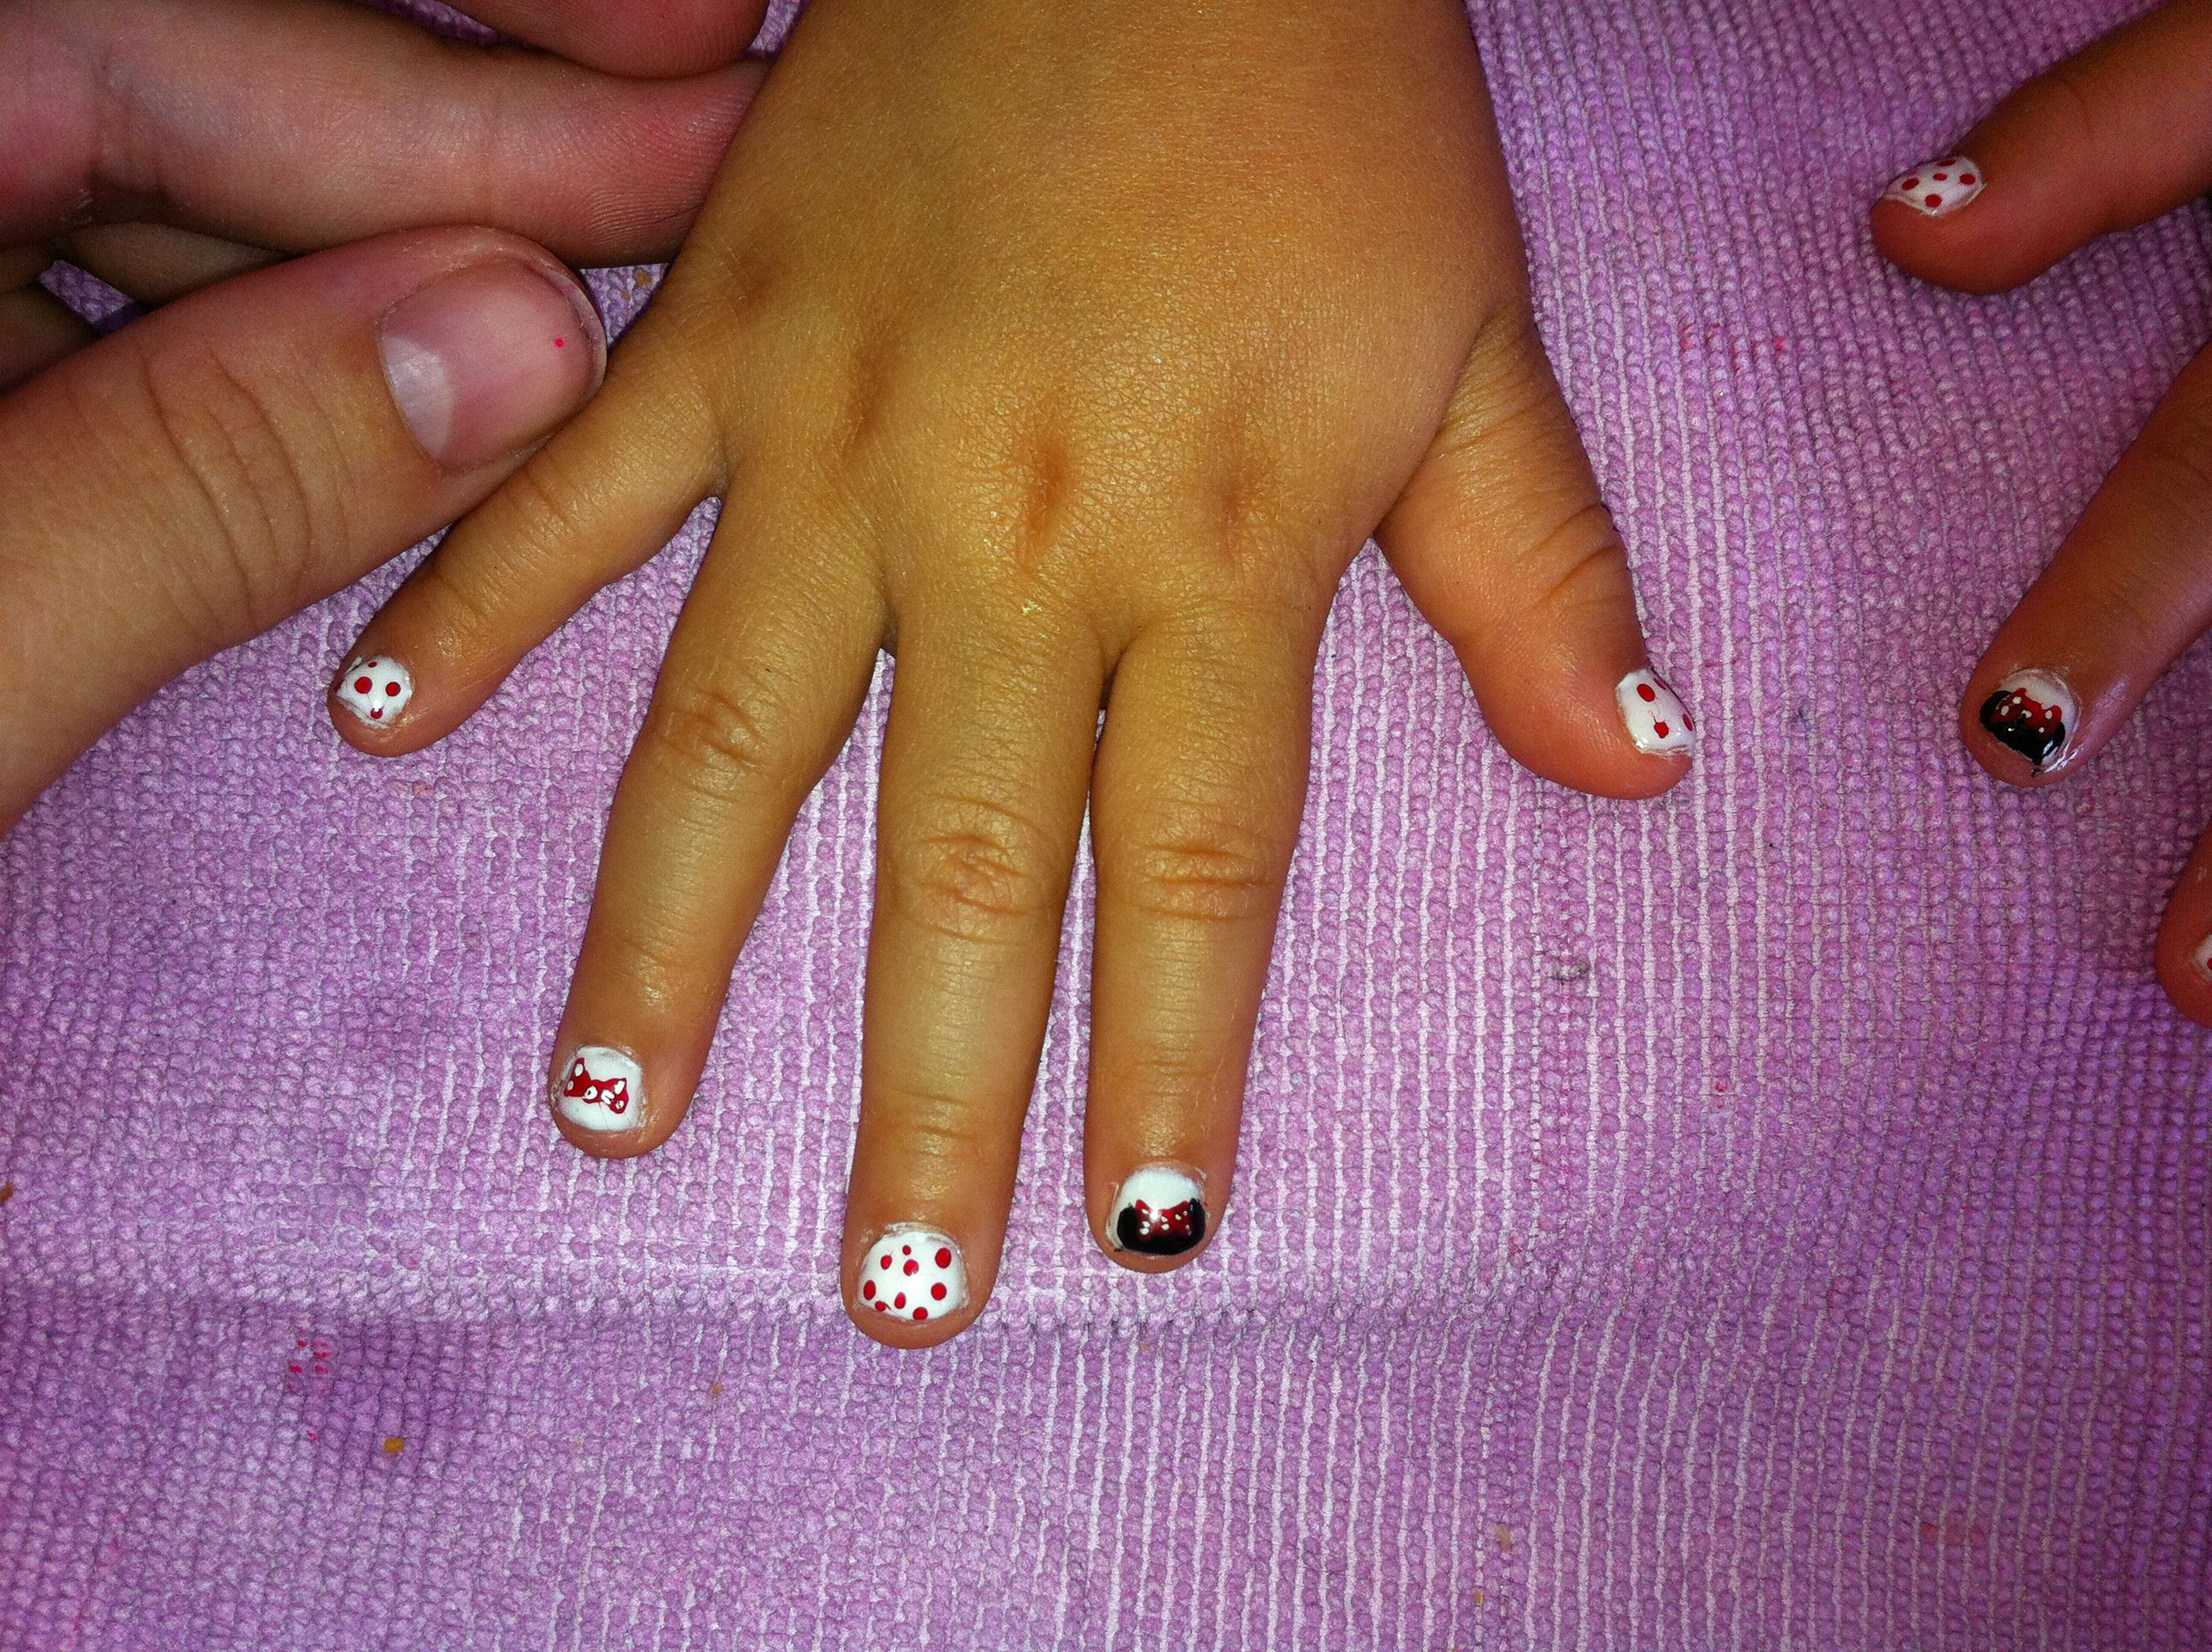 Minnie Mouse nails II By Kristi Owens  At Astonish salon  Midland tx